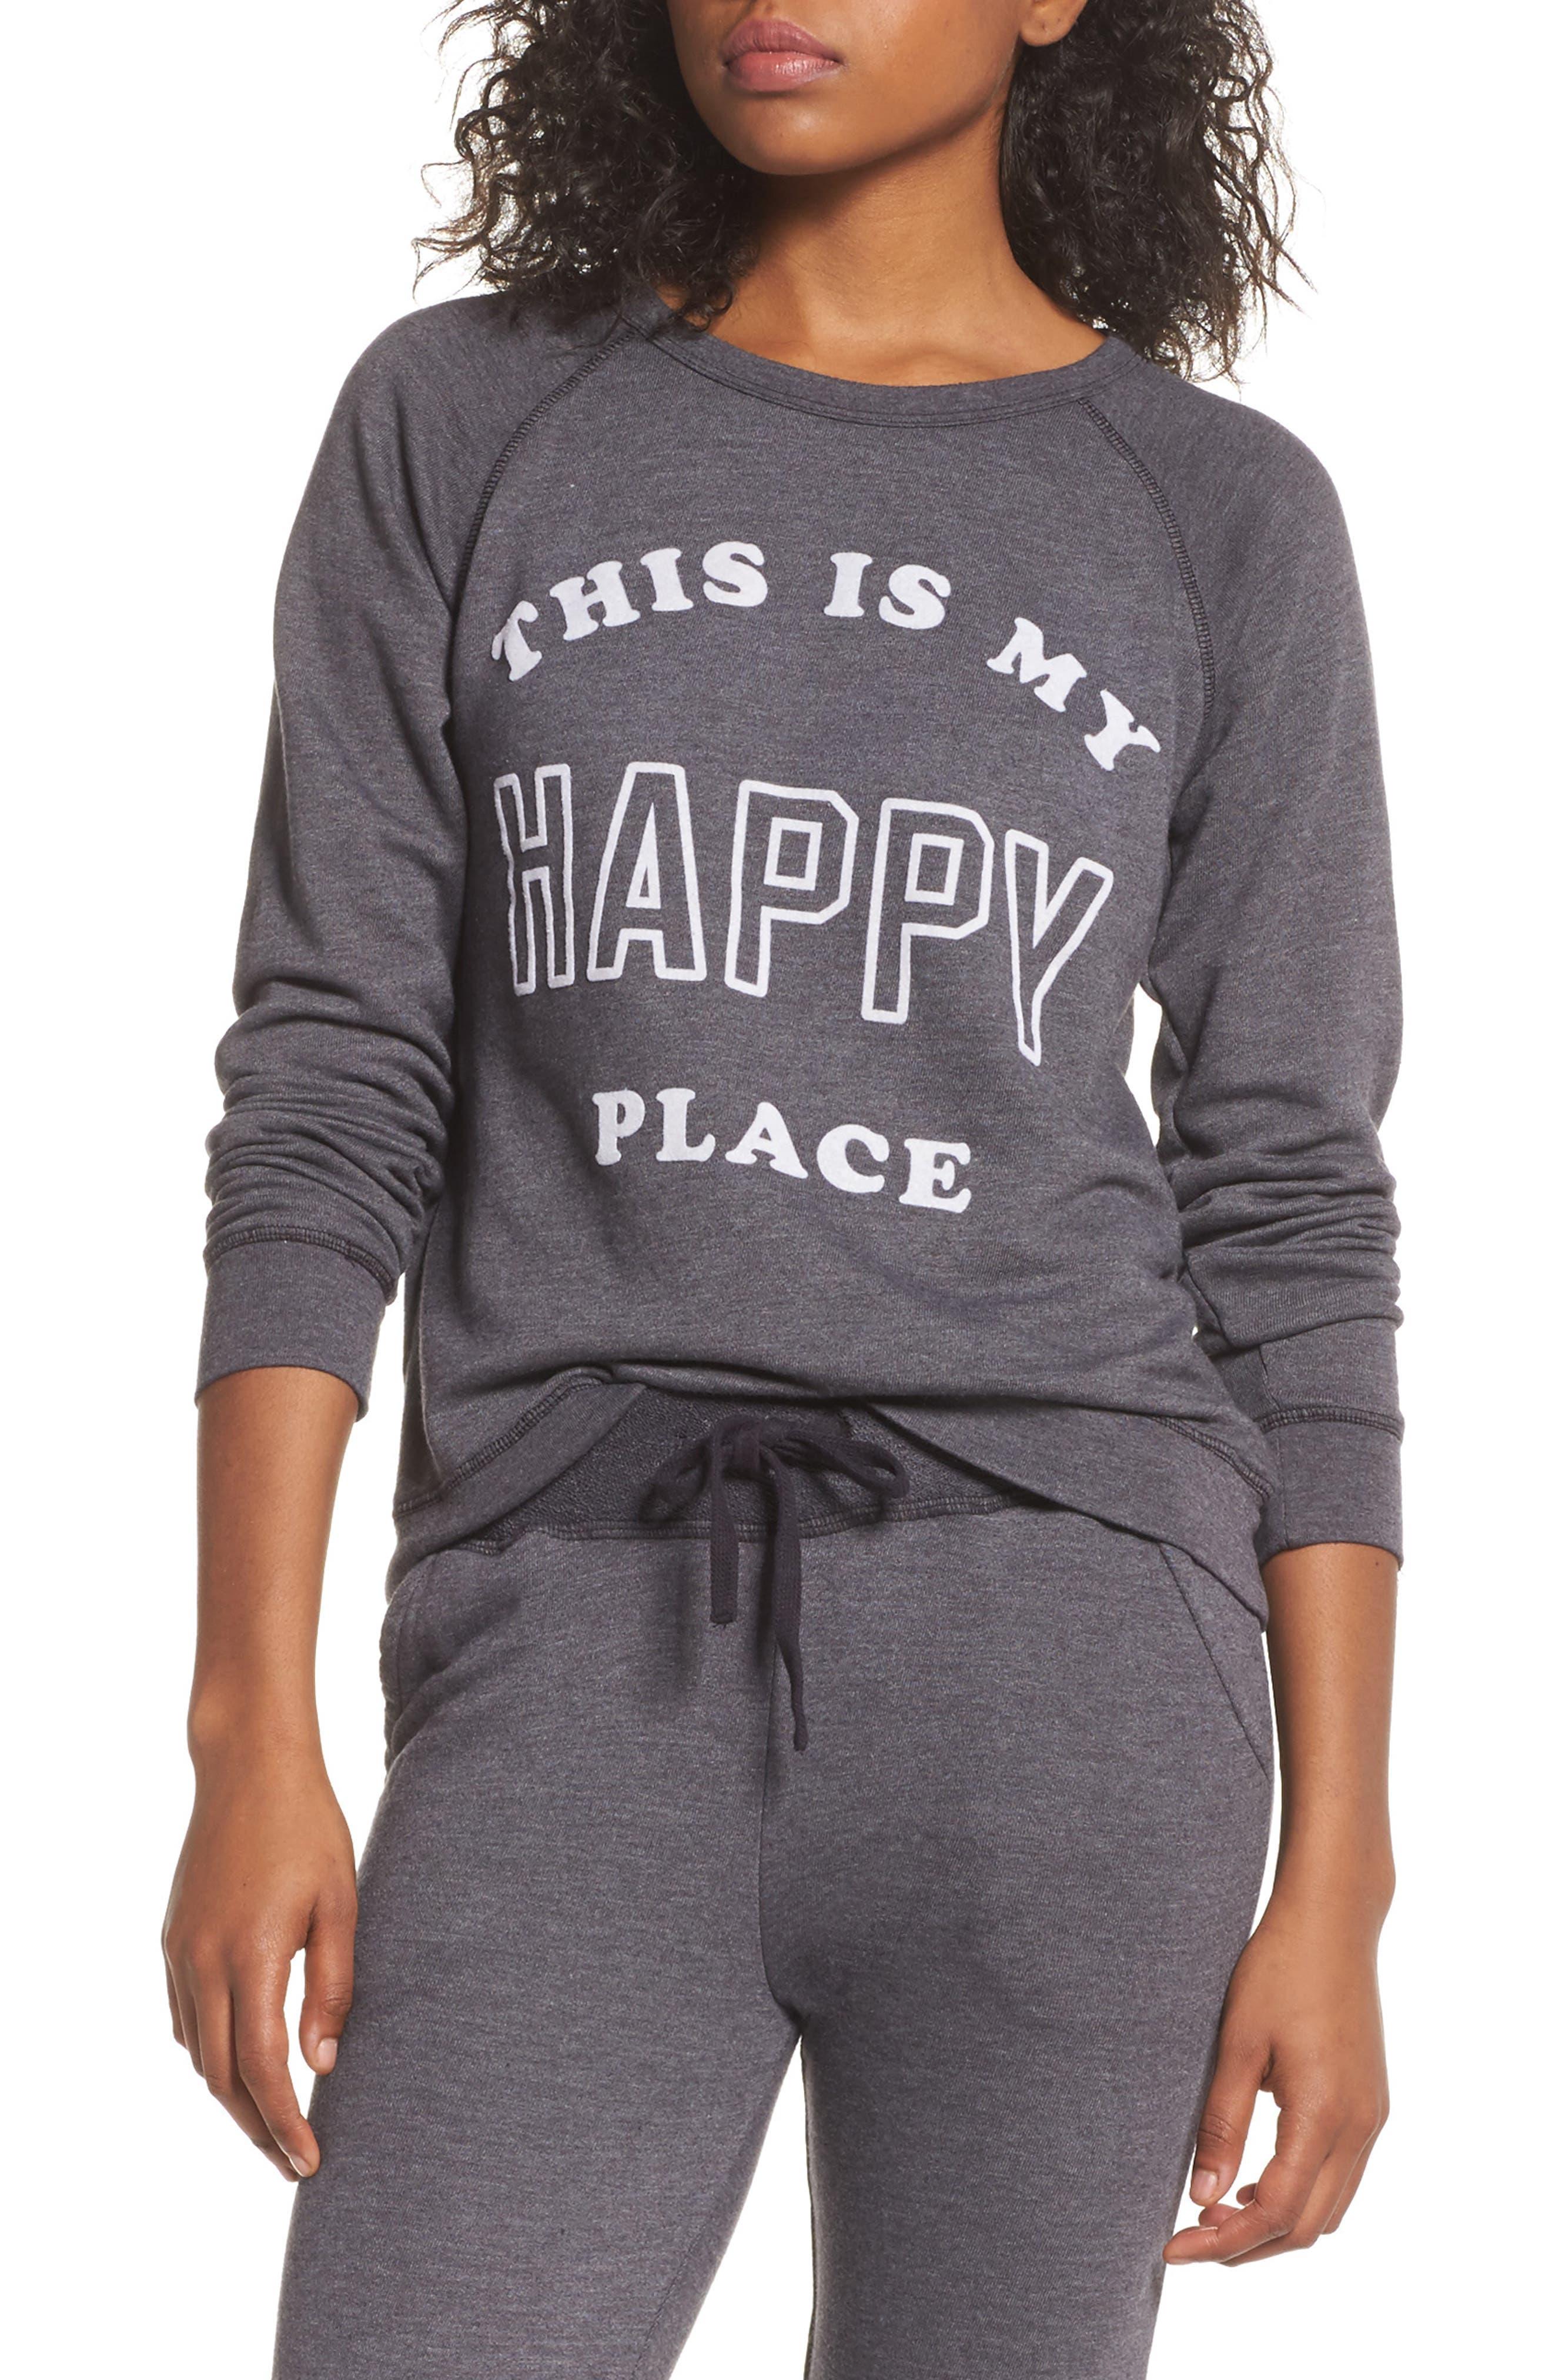 Alternate Image 1 Selected - Junk Food Happy Place Sweatshirt